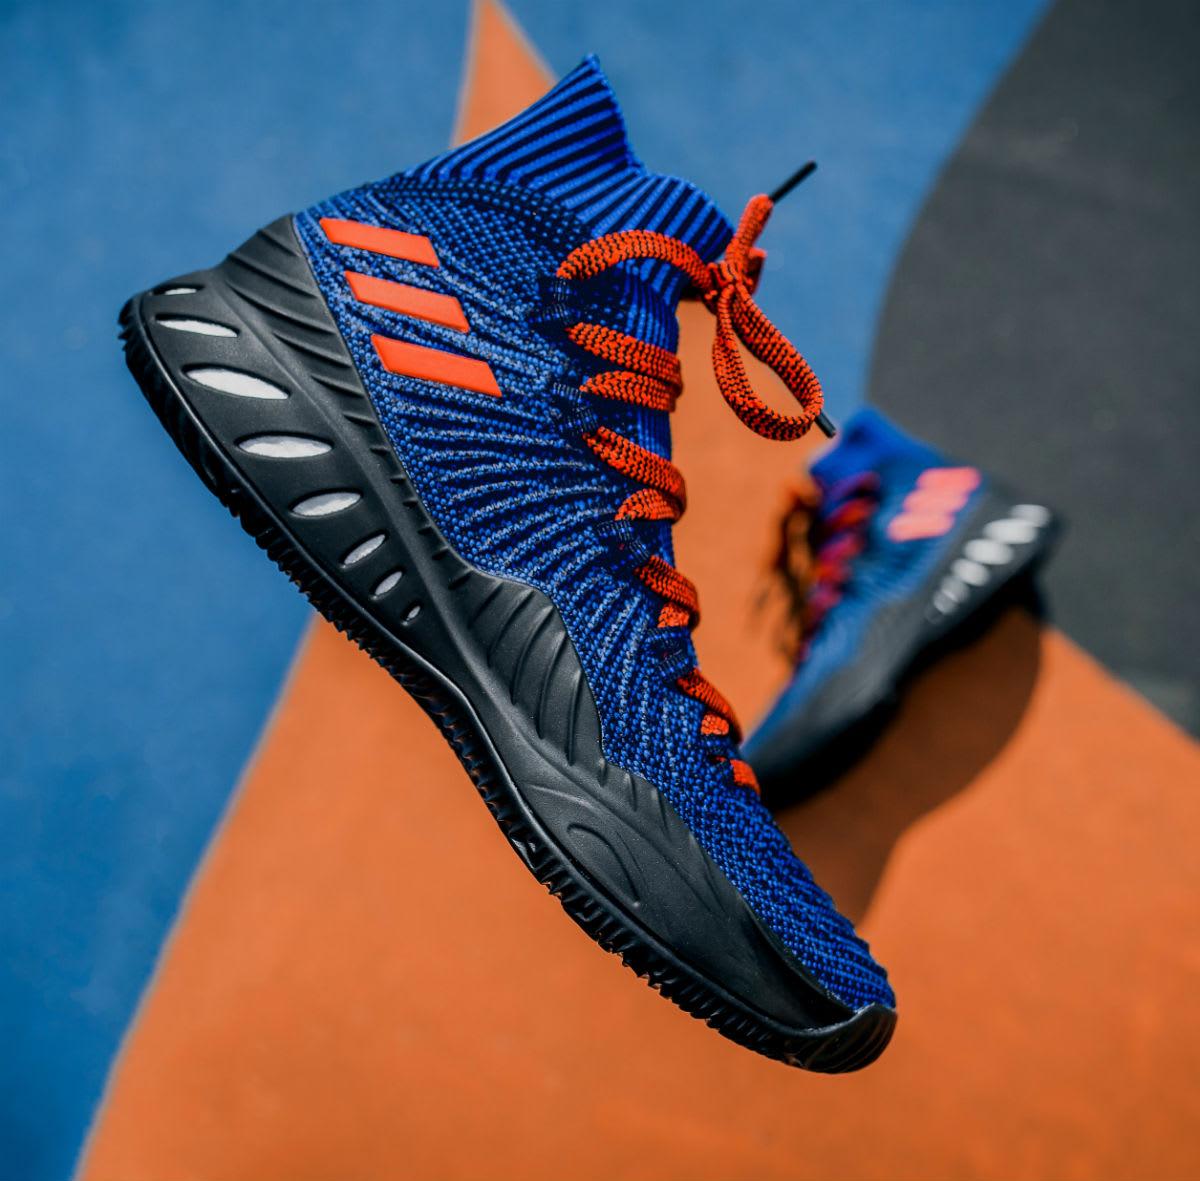 Adidas Crazy Explosive Kristaps Porzingis PE Release Date (5)